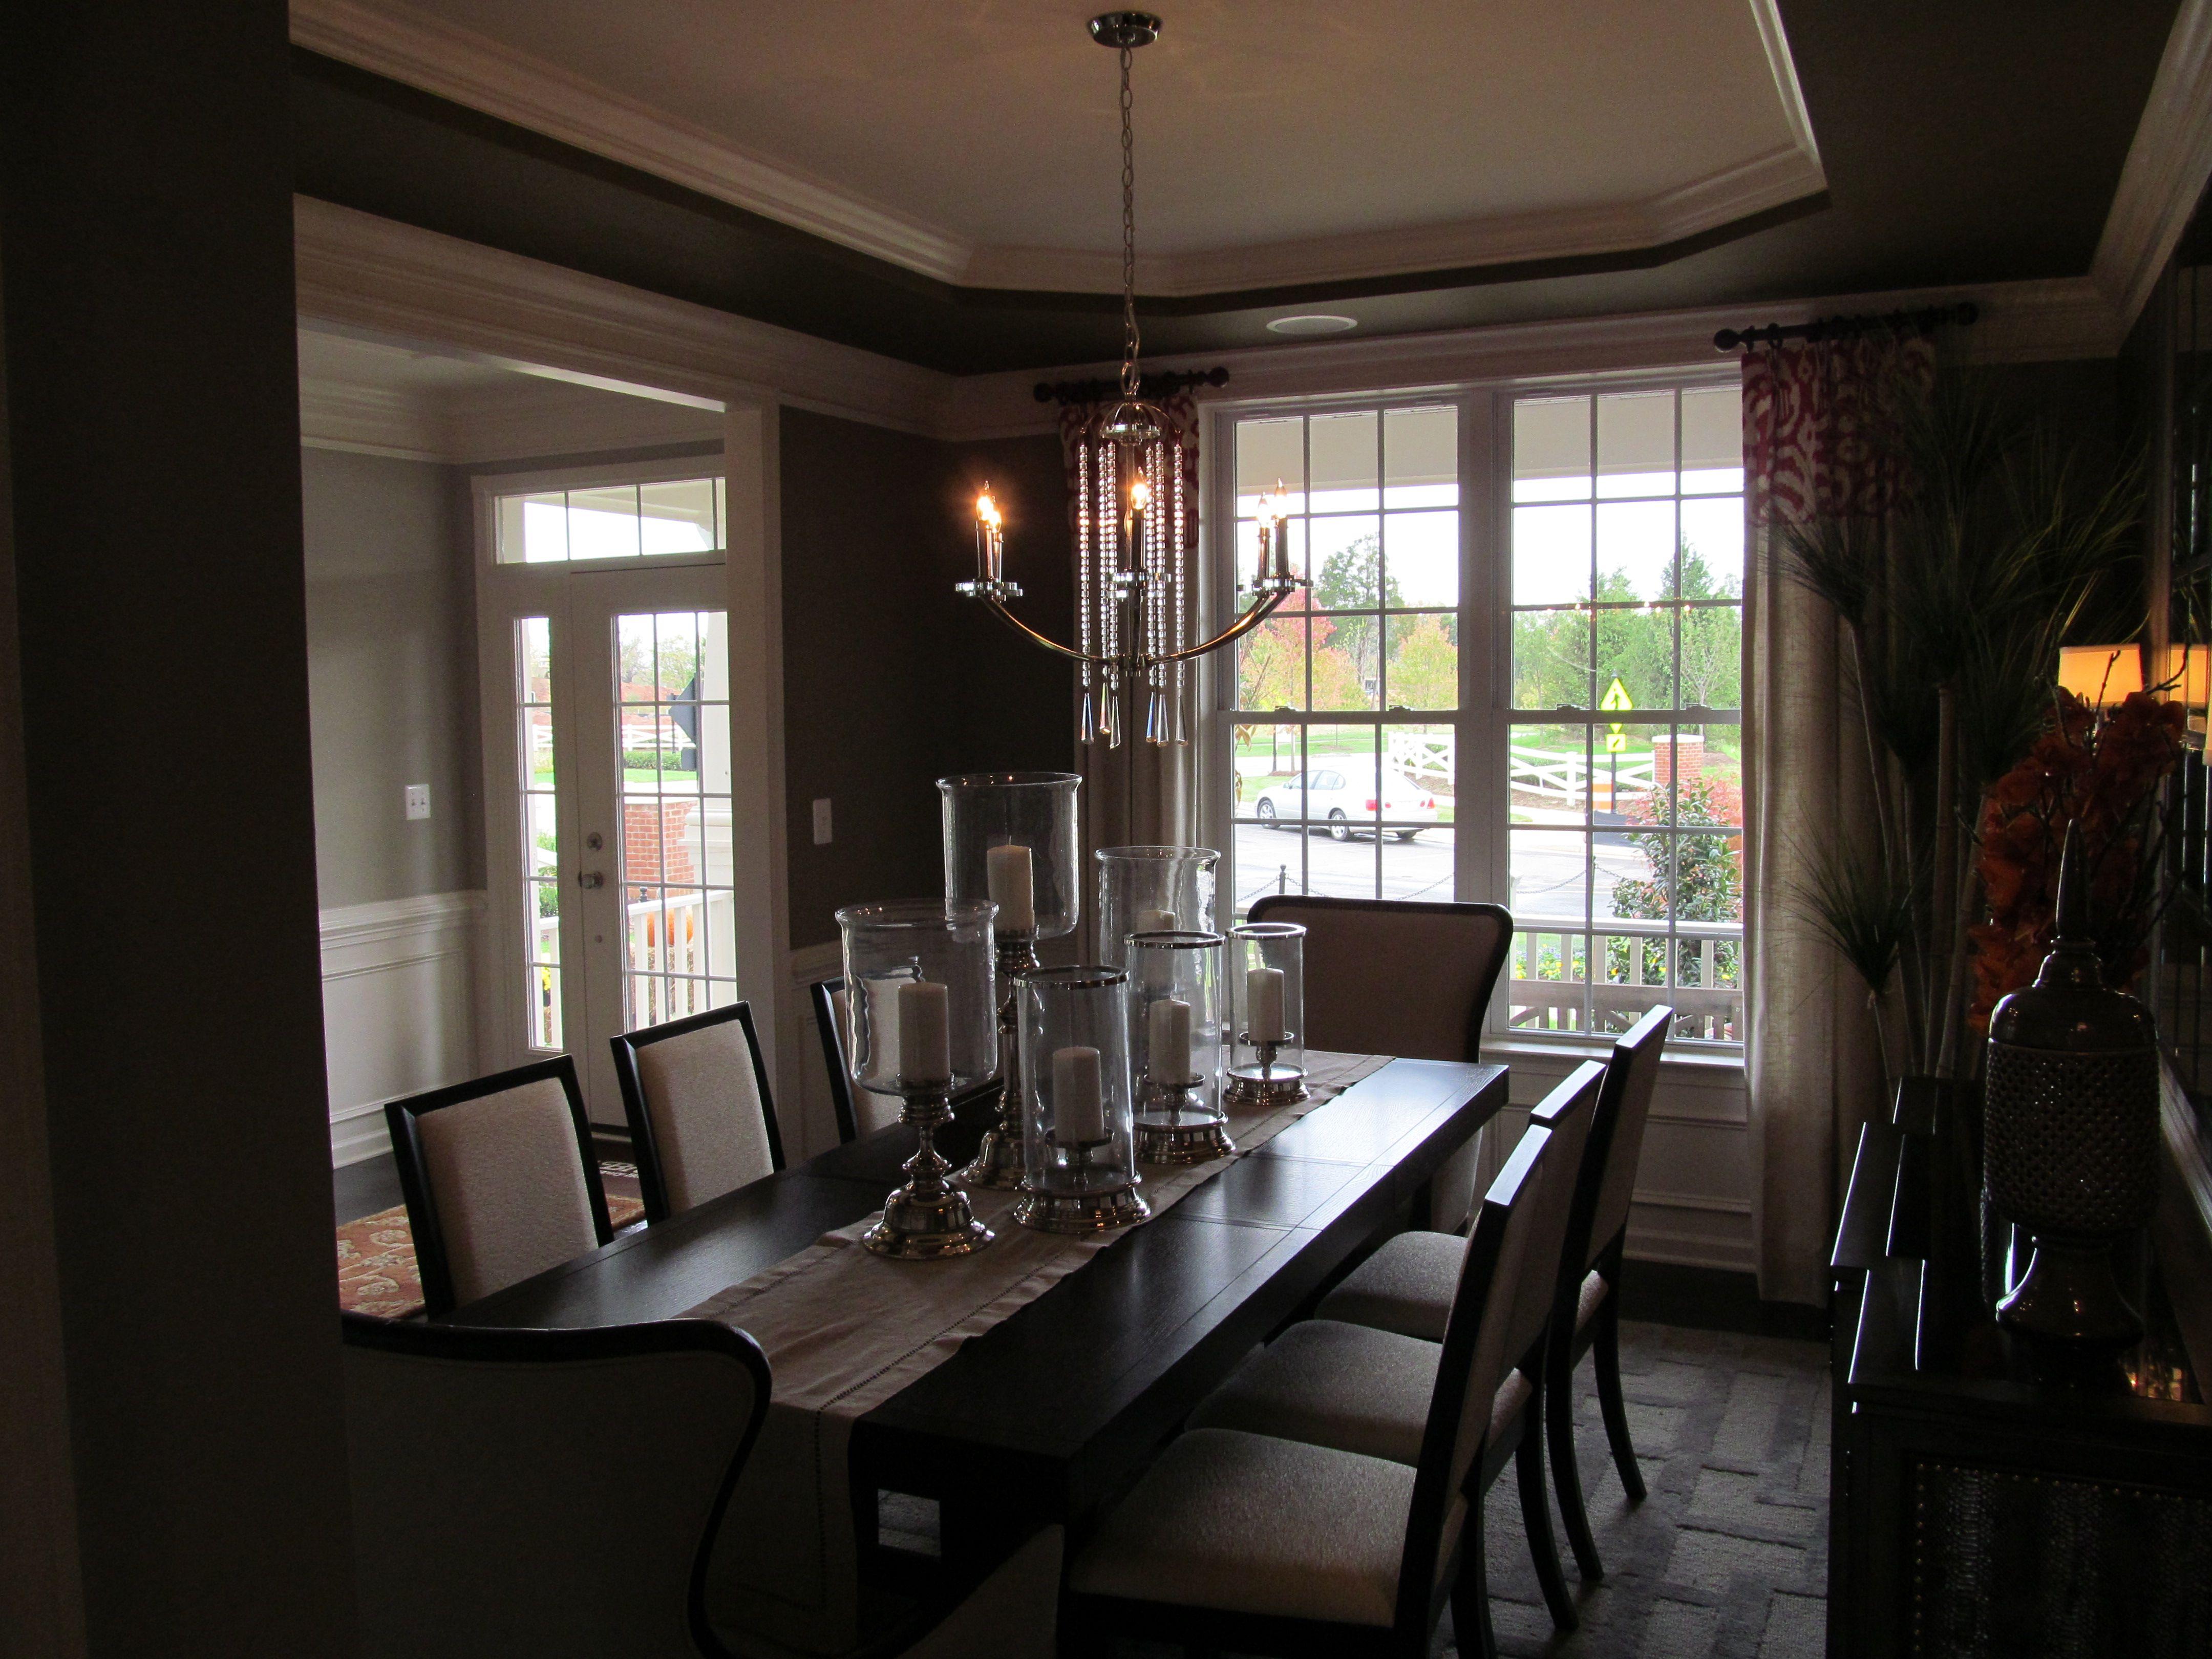 Dining room in the Carolina model